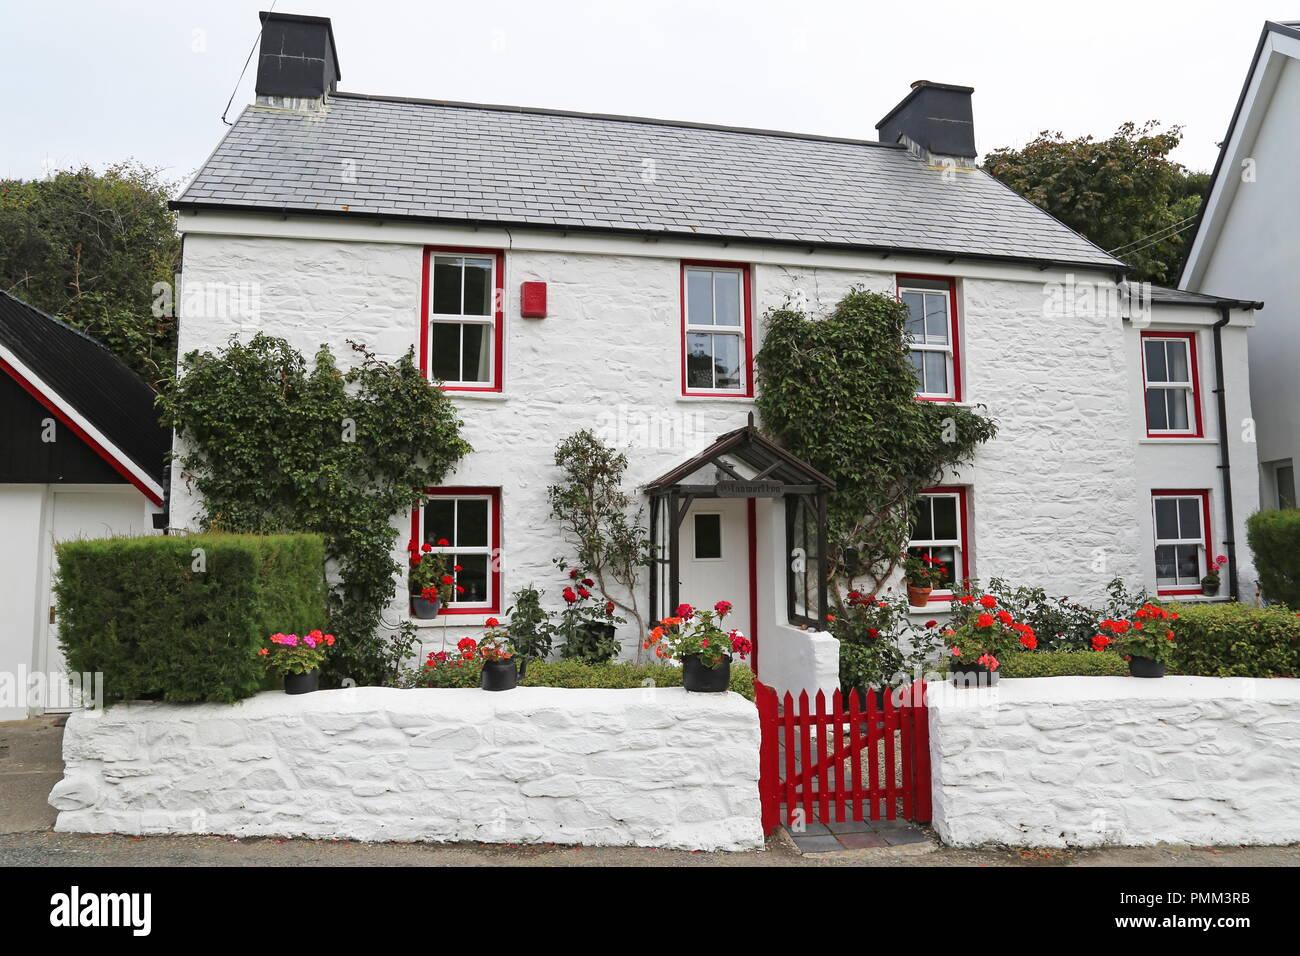 Glanmorllyn cottage, Cwmtydu, Cardigan Bay, Ceredigion, Wales, Great Britain, United Kingdom, UK, Europe - Stock Image